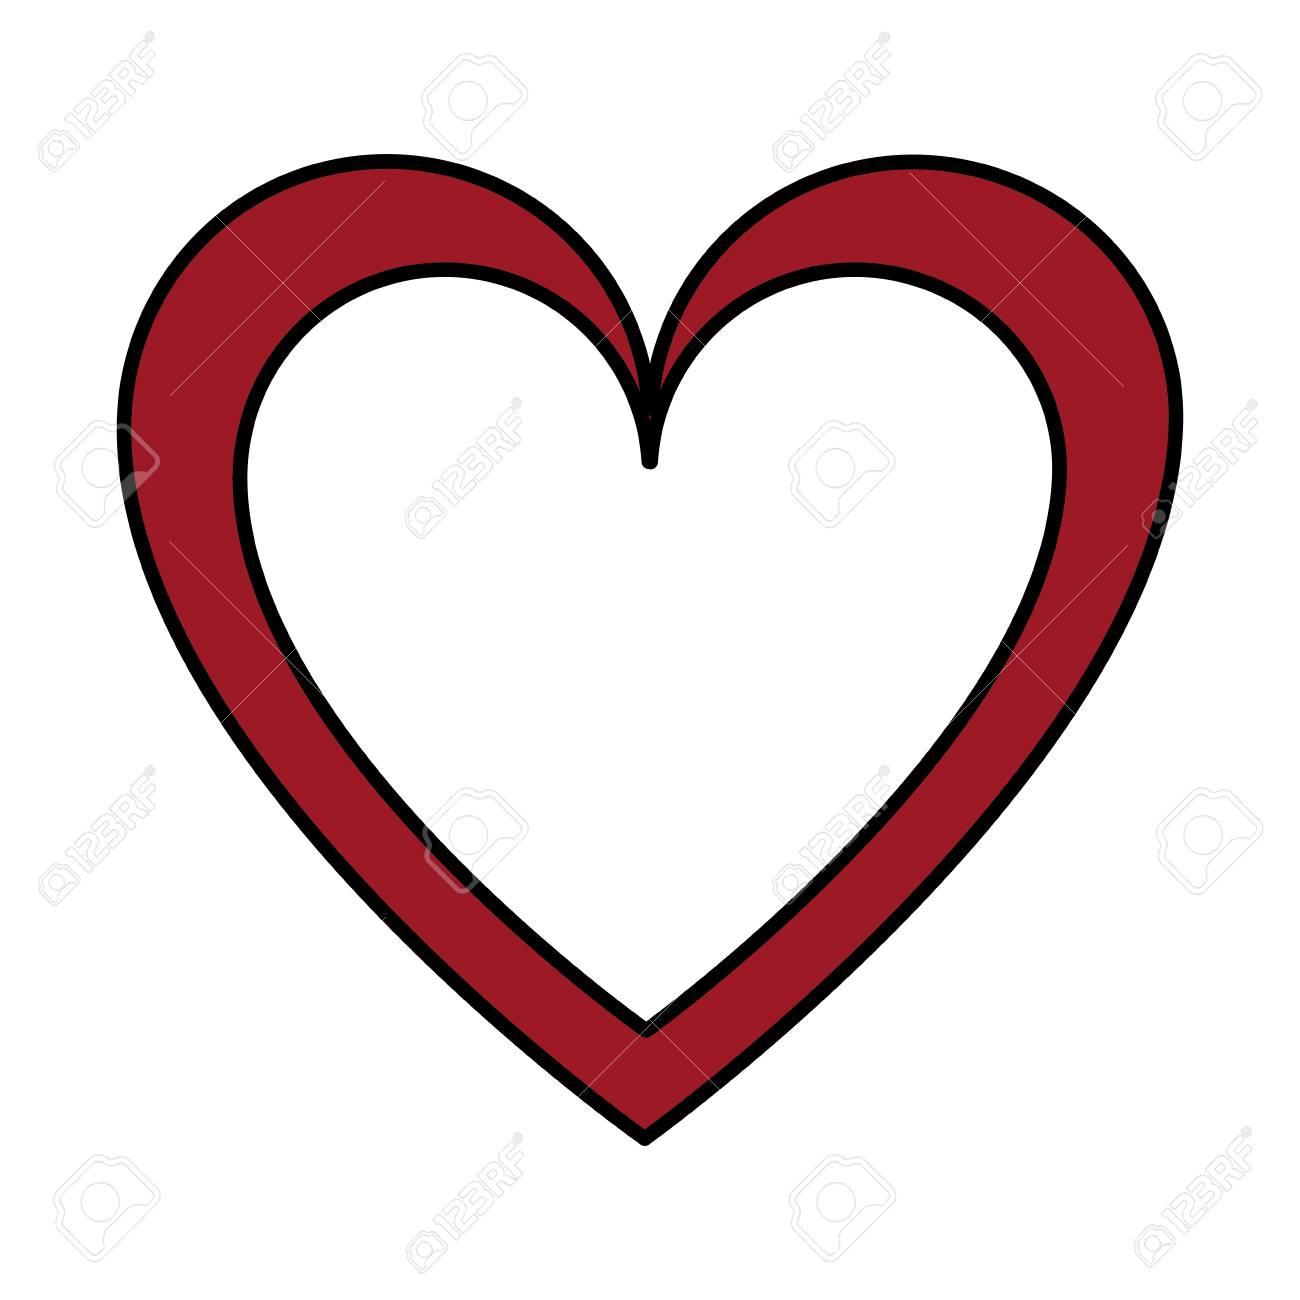 Heart Love Symbol Of Passion Design Vector Illustration Royalty Free